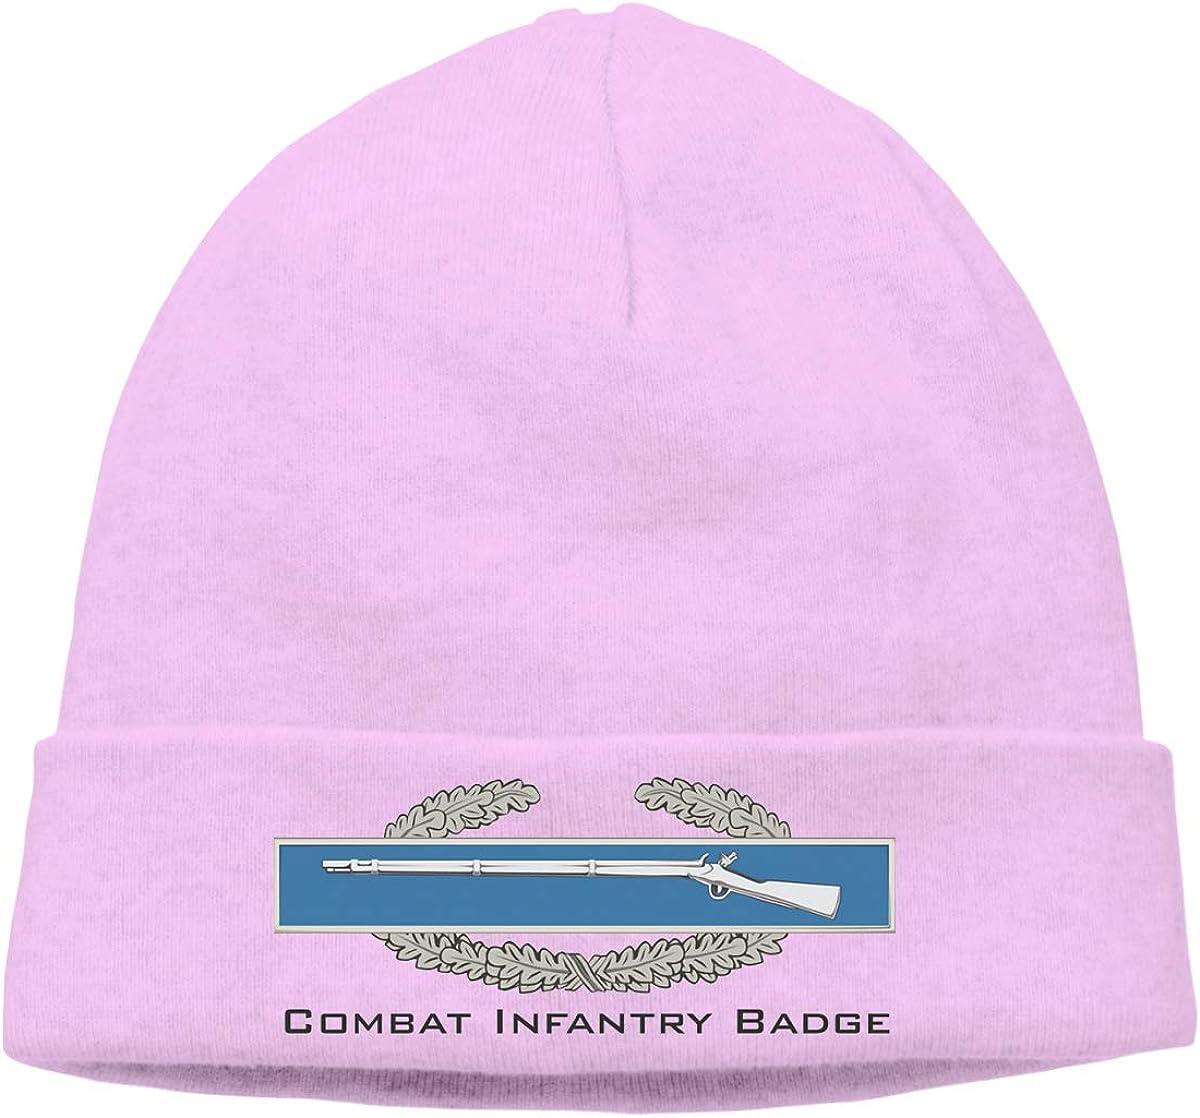 Combat Infantry Badge Men Women Beanie Hat Knitted Beanie Knit Beanie CIB